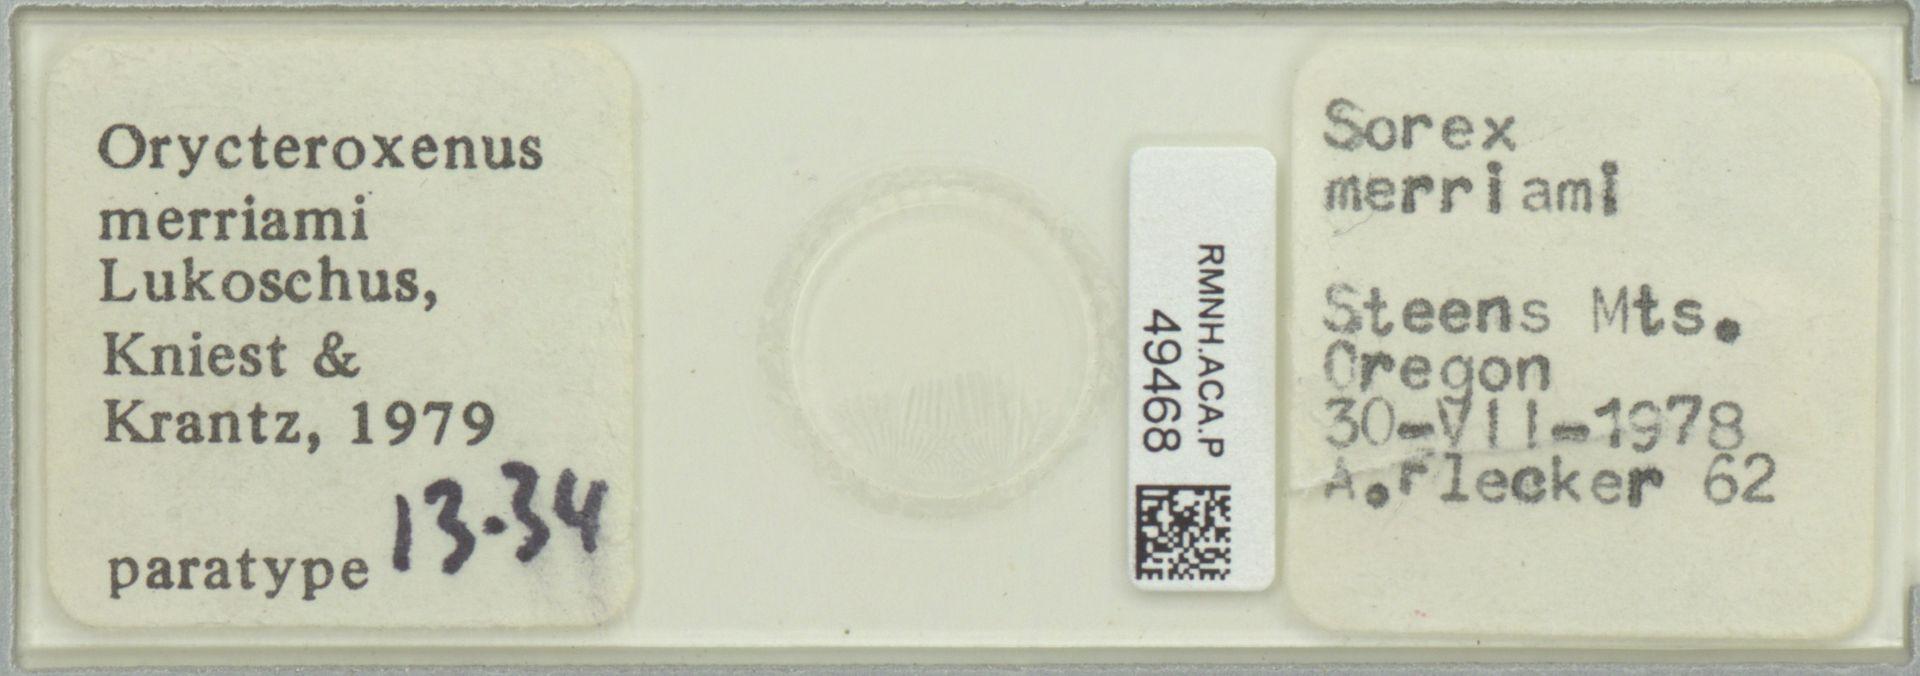 RMNH.ACA.P.49468 | Orycteroxenus merriami Lukoschus, Kniest & Krantz, 1979